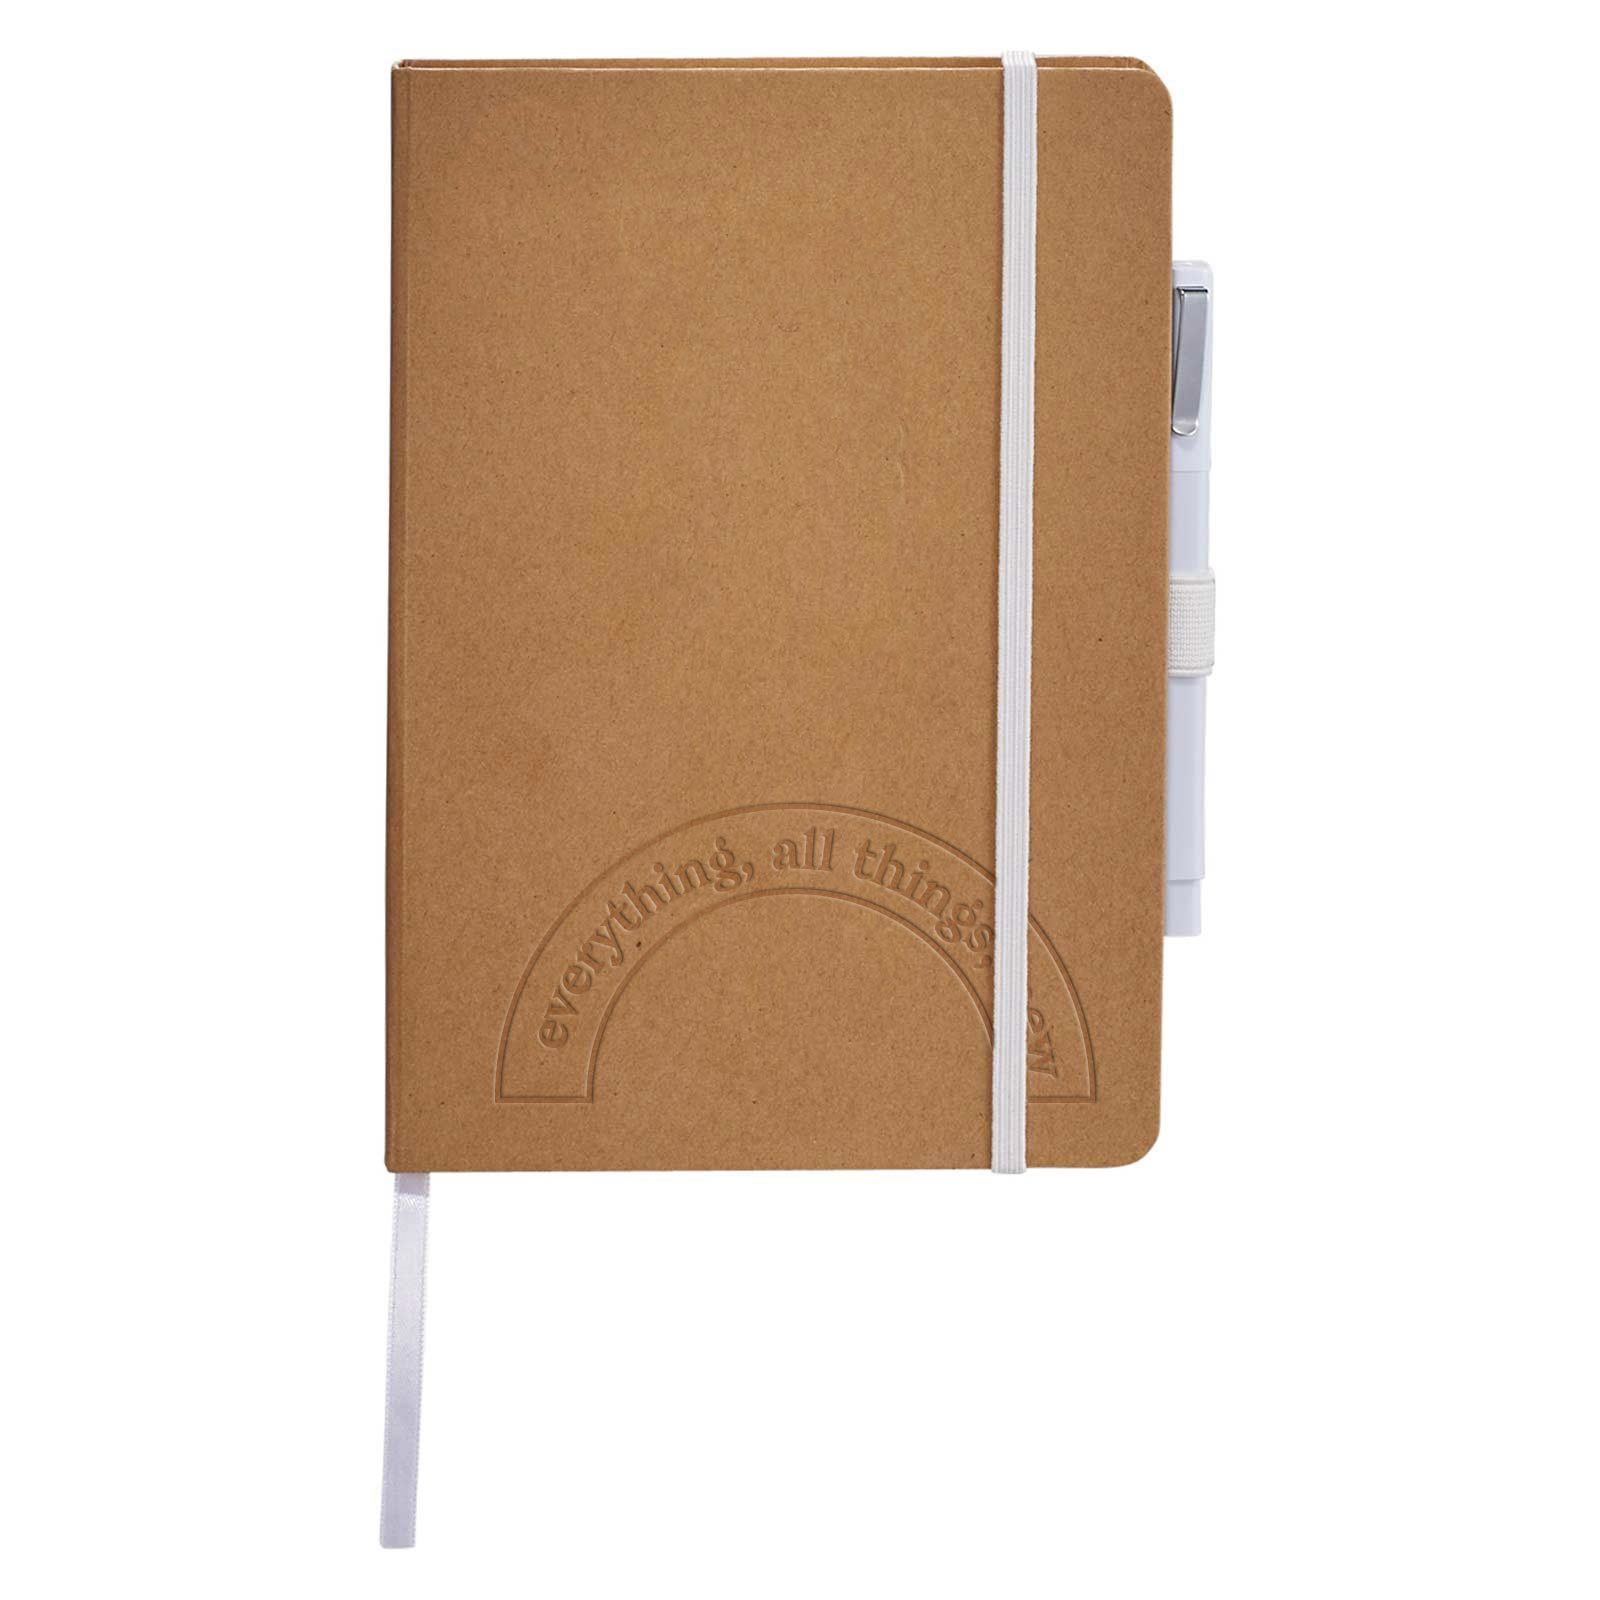 200652 eco colorpop journal set one color one location imprint or blind deboss